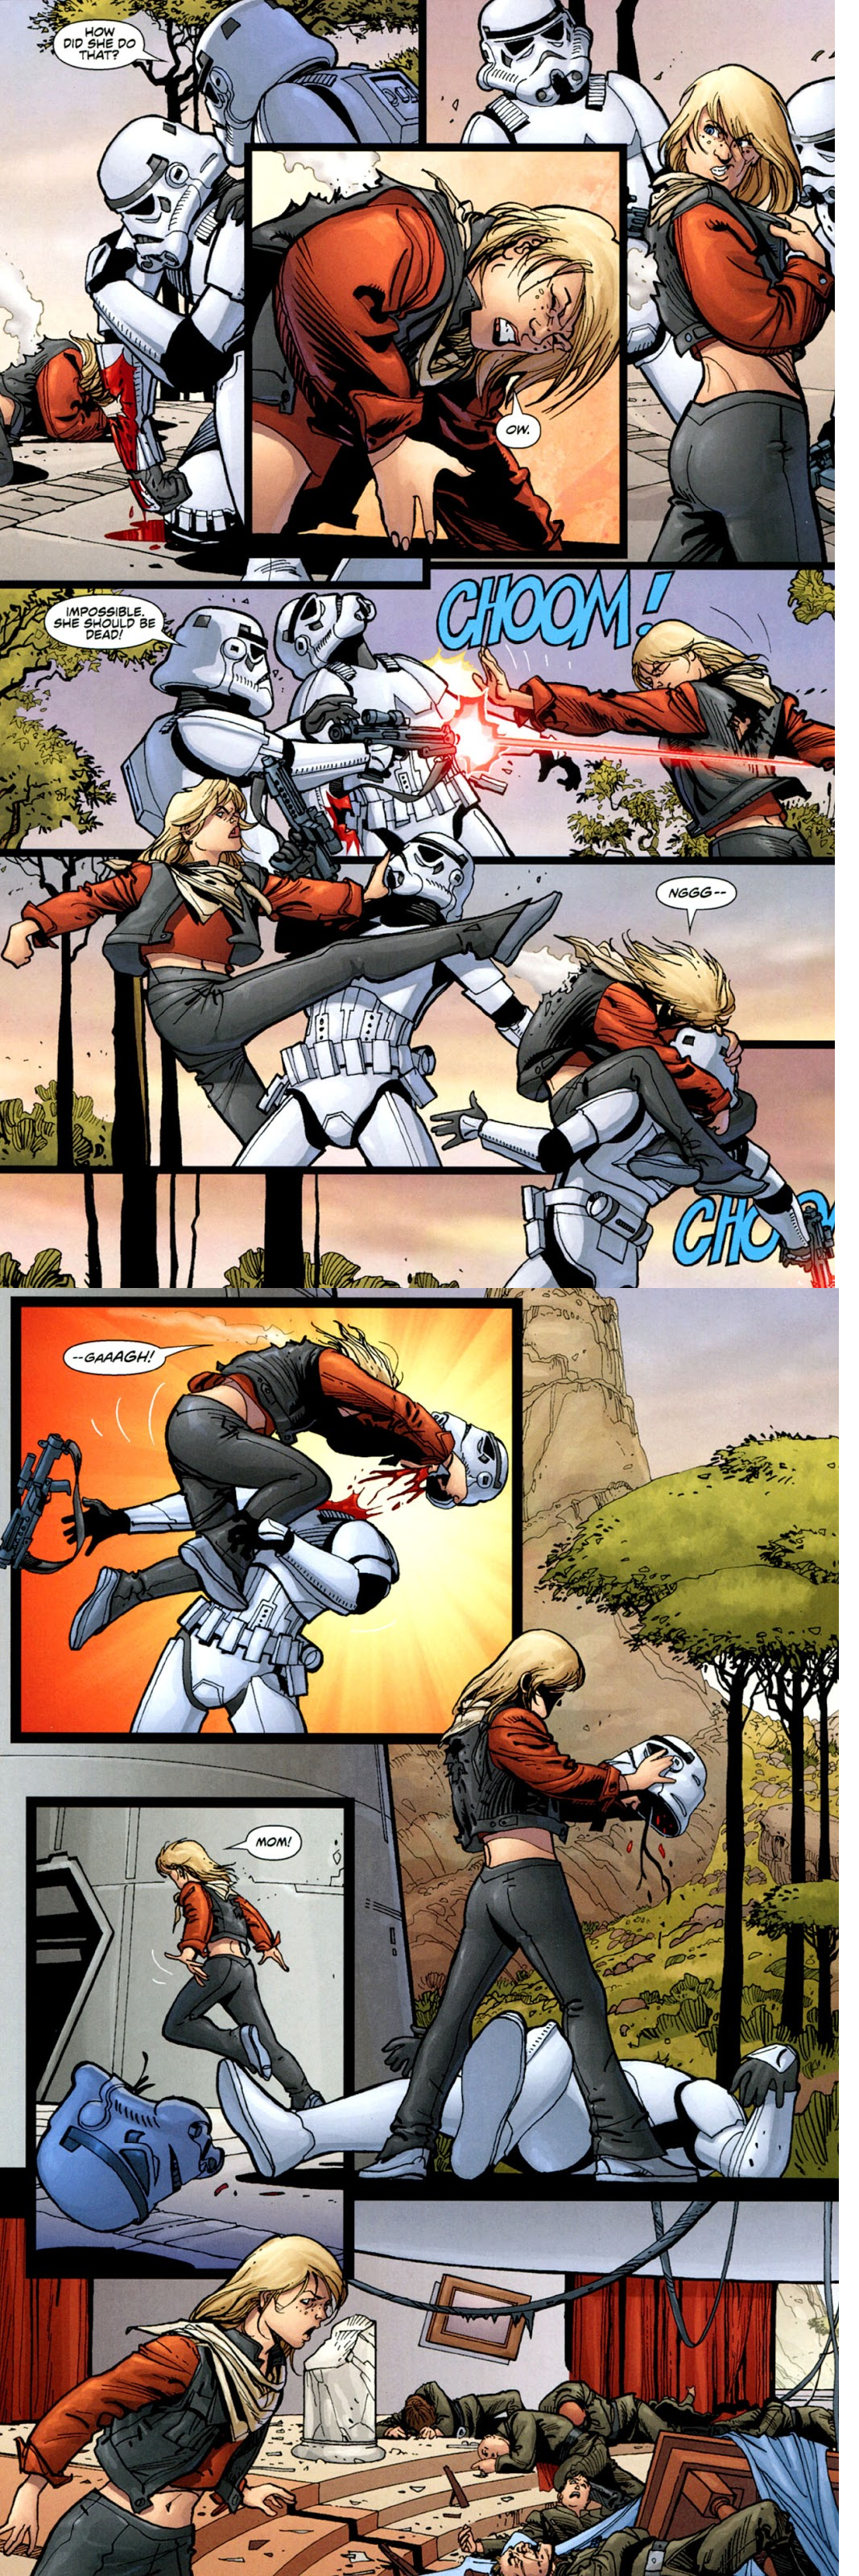 Stomper Showdown R2 #8 - Antares Draco (Informal Geek) vs TUF! Jacen Solo (RNGesus4) Chick_from_Invasion